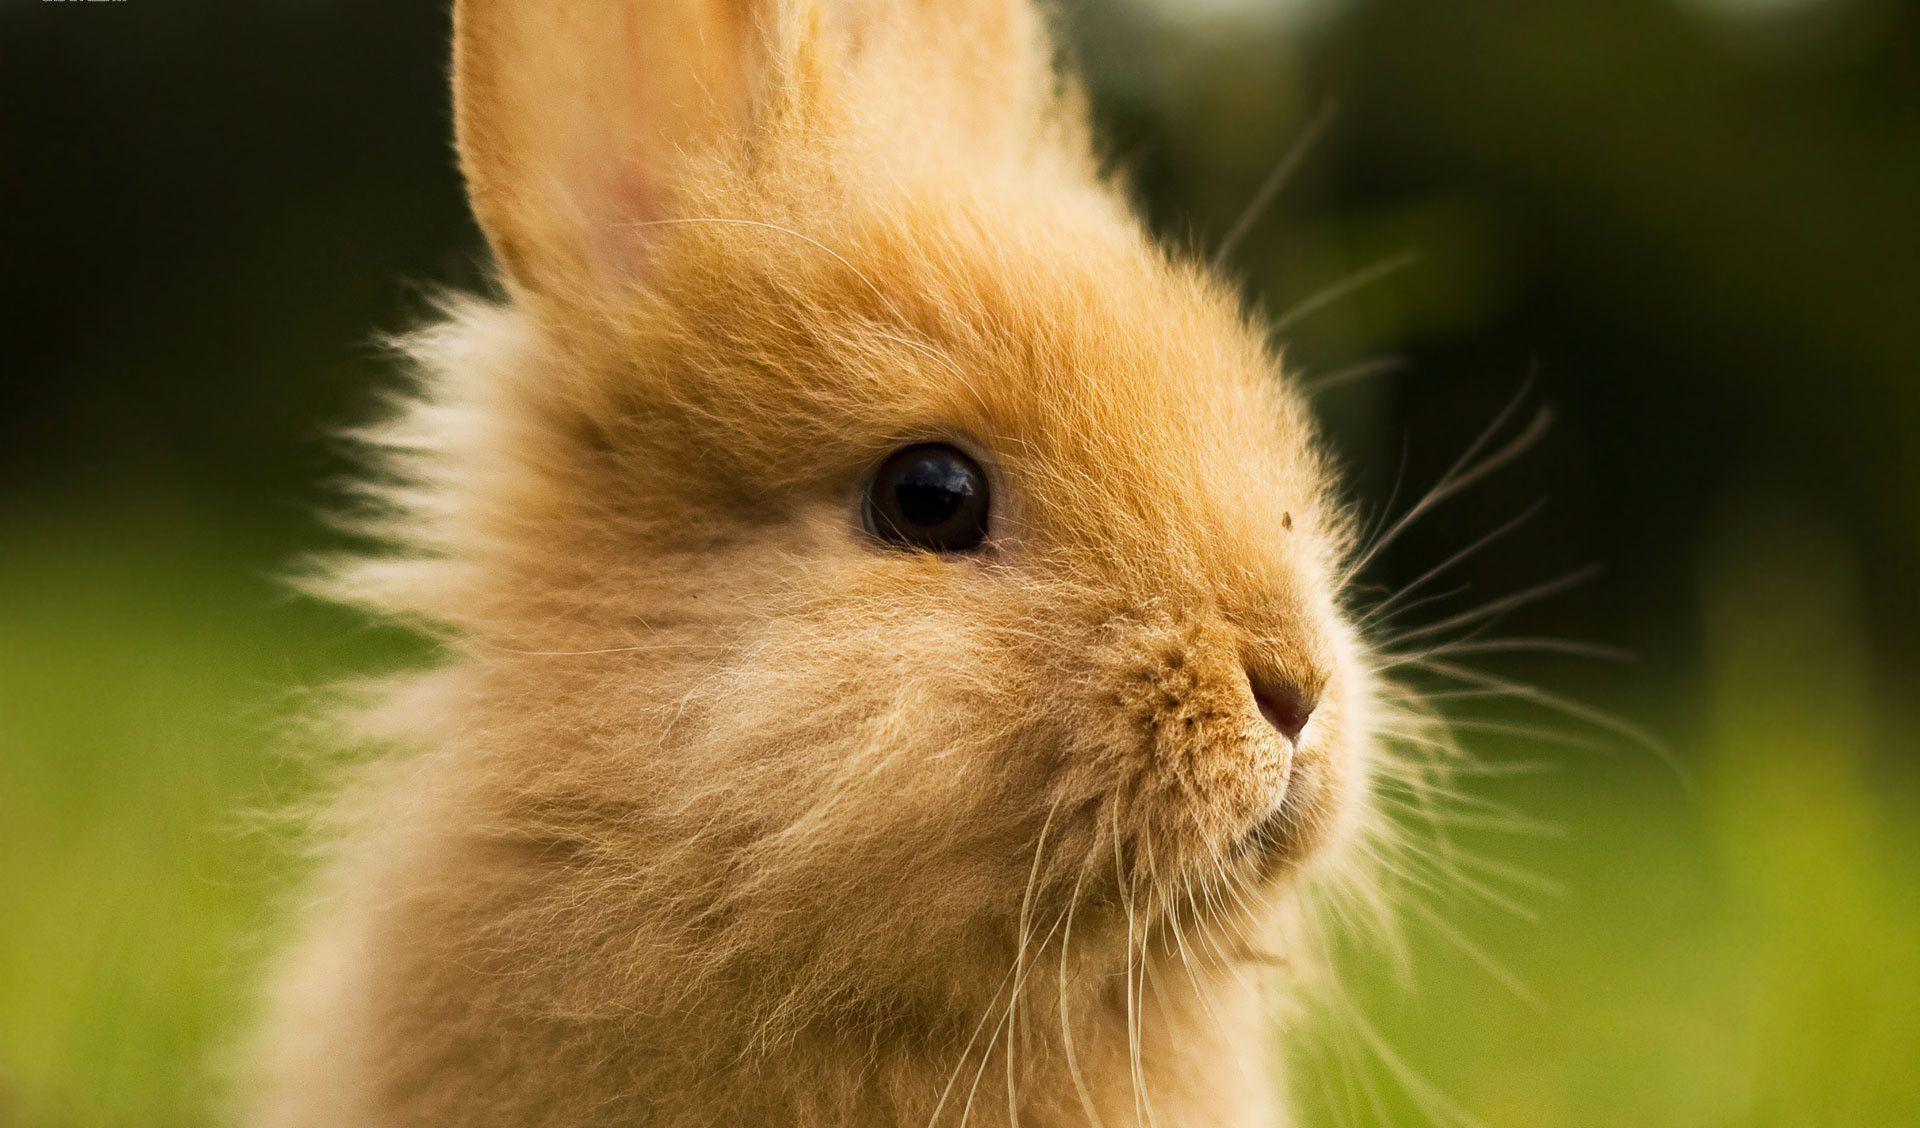 Cute White Rabbit Wallpapers For Desktop: Cute Bunnies Wallpaper (65+ Images